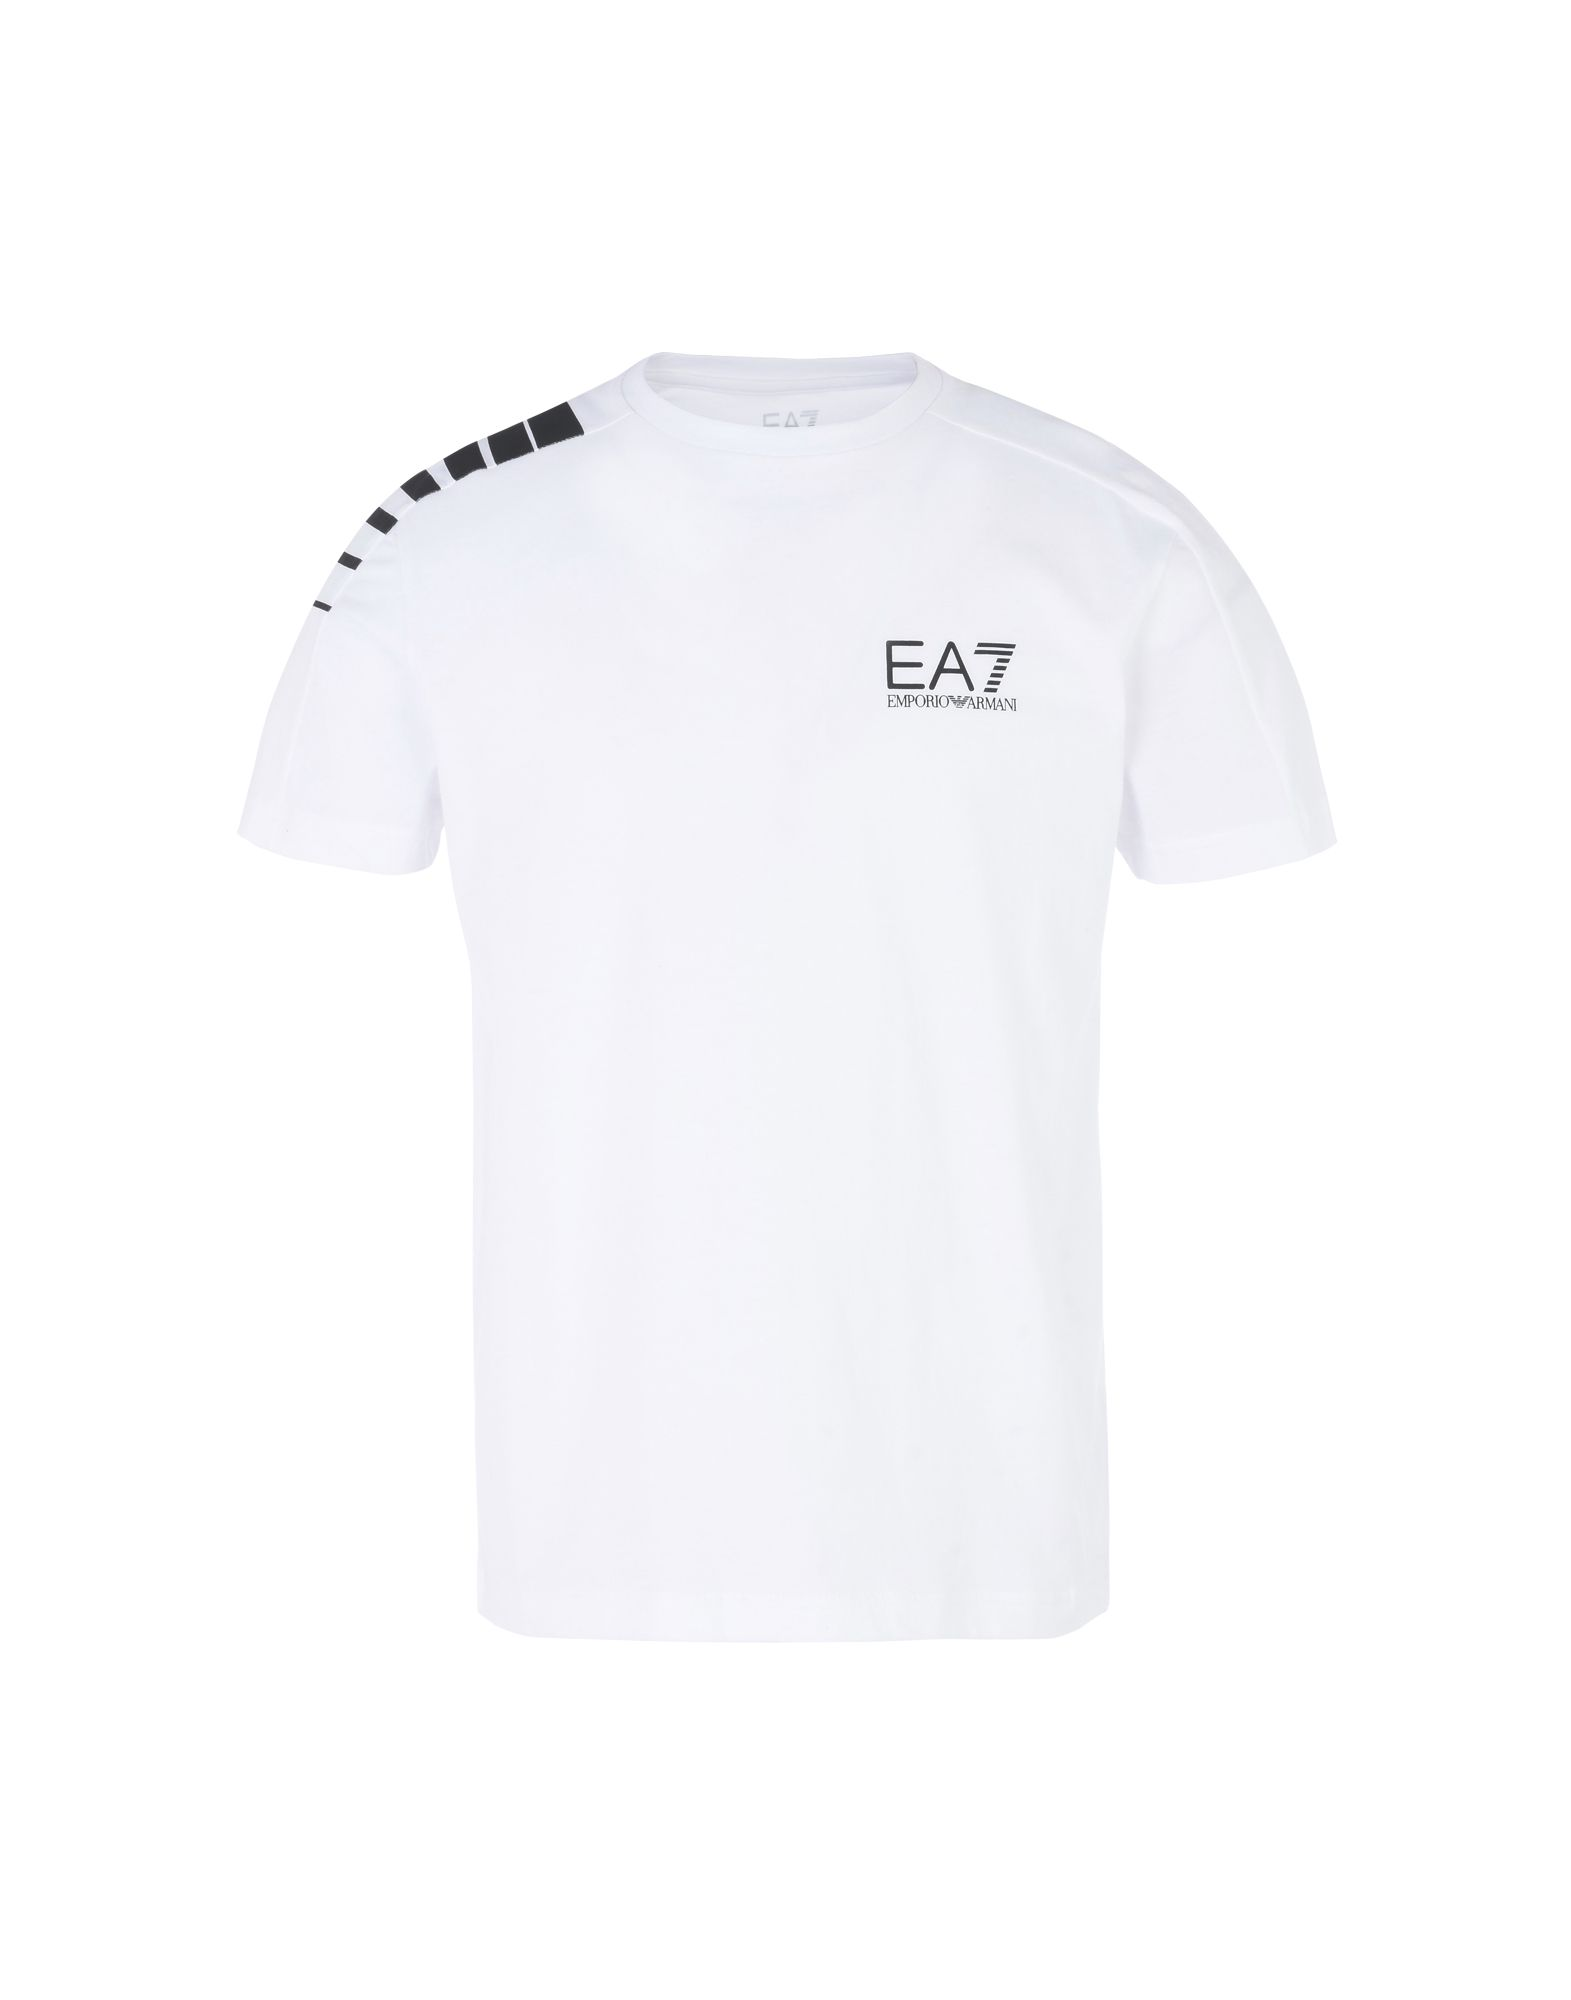 T-Shirt Ea7 Coft Train 7 Lines M Tee Coft Ea7 - Uomo - 12018225PD ec75ce